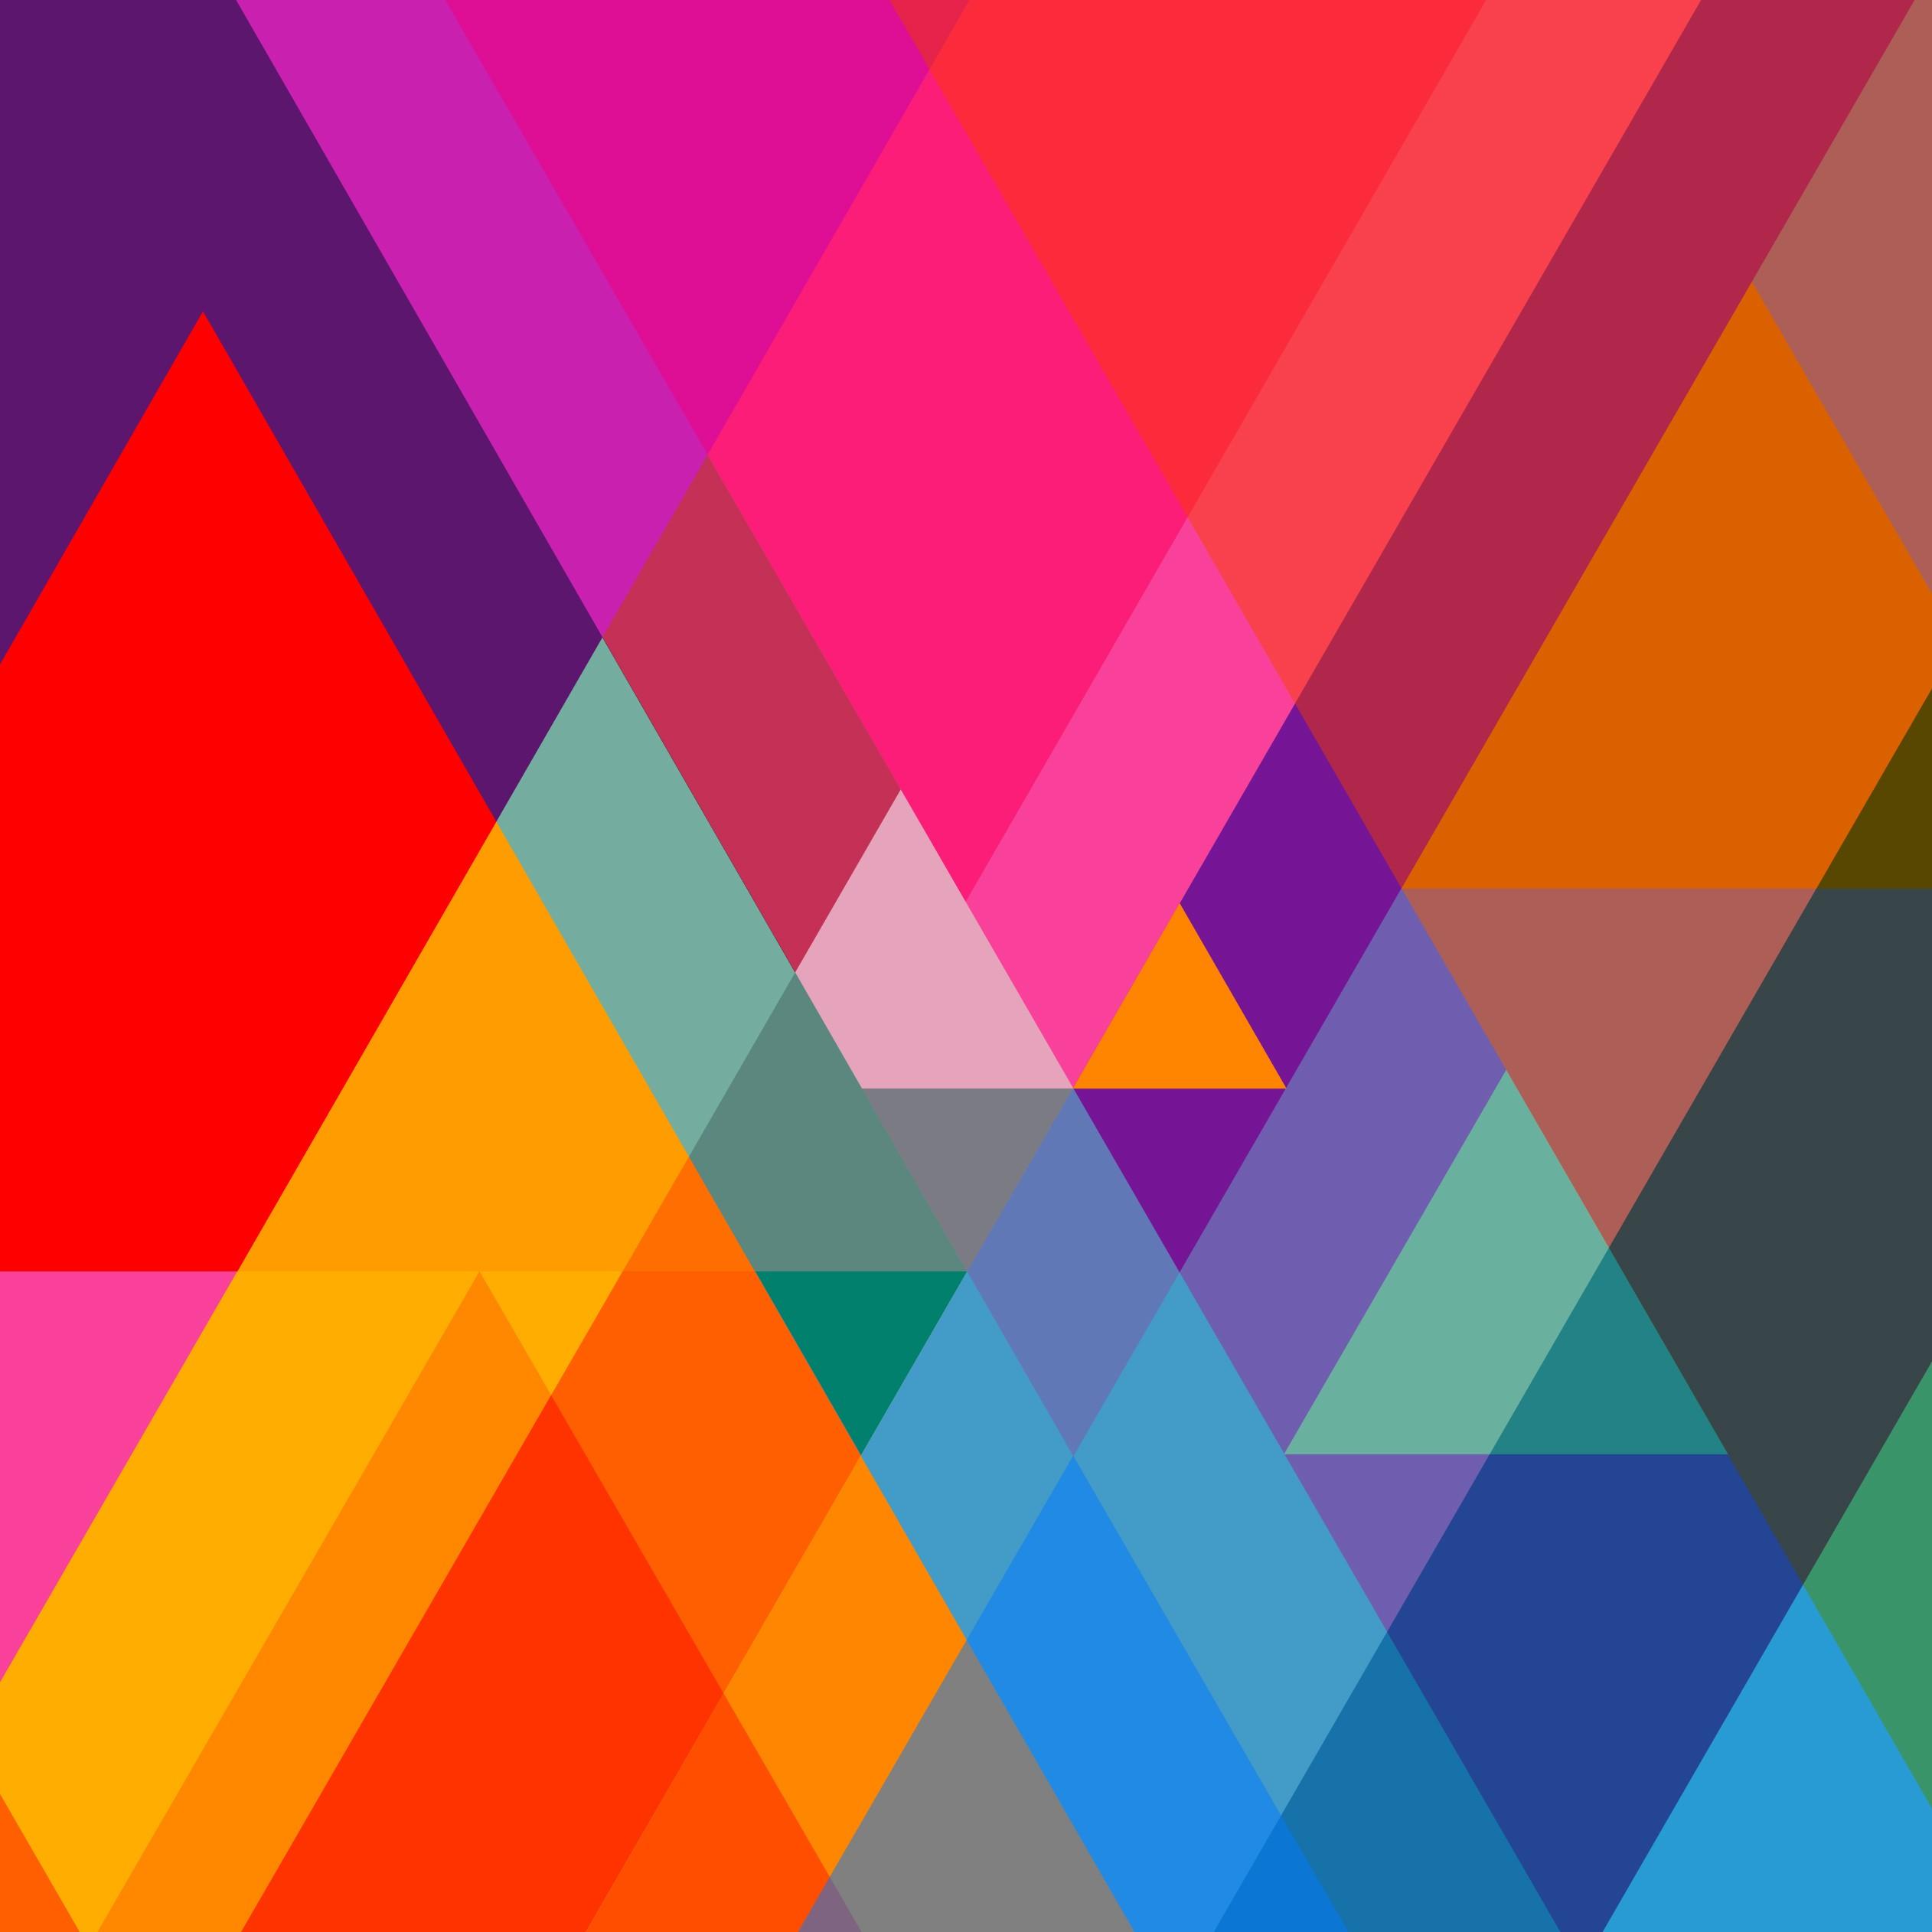 Cool Wallpaper Macbook Geometric - polygon-2524x2524-4k-5k-wallpaper-iphone-wallpaper-triangle-3520  Perfect Image Reference_539760.jpg